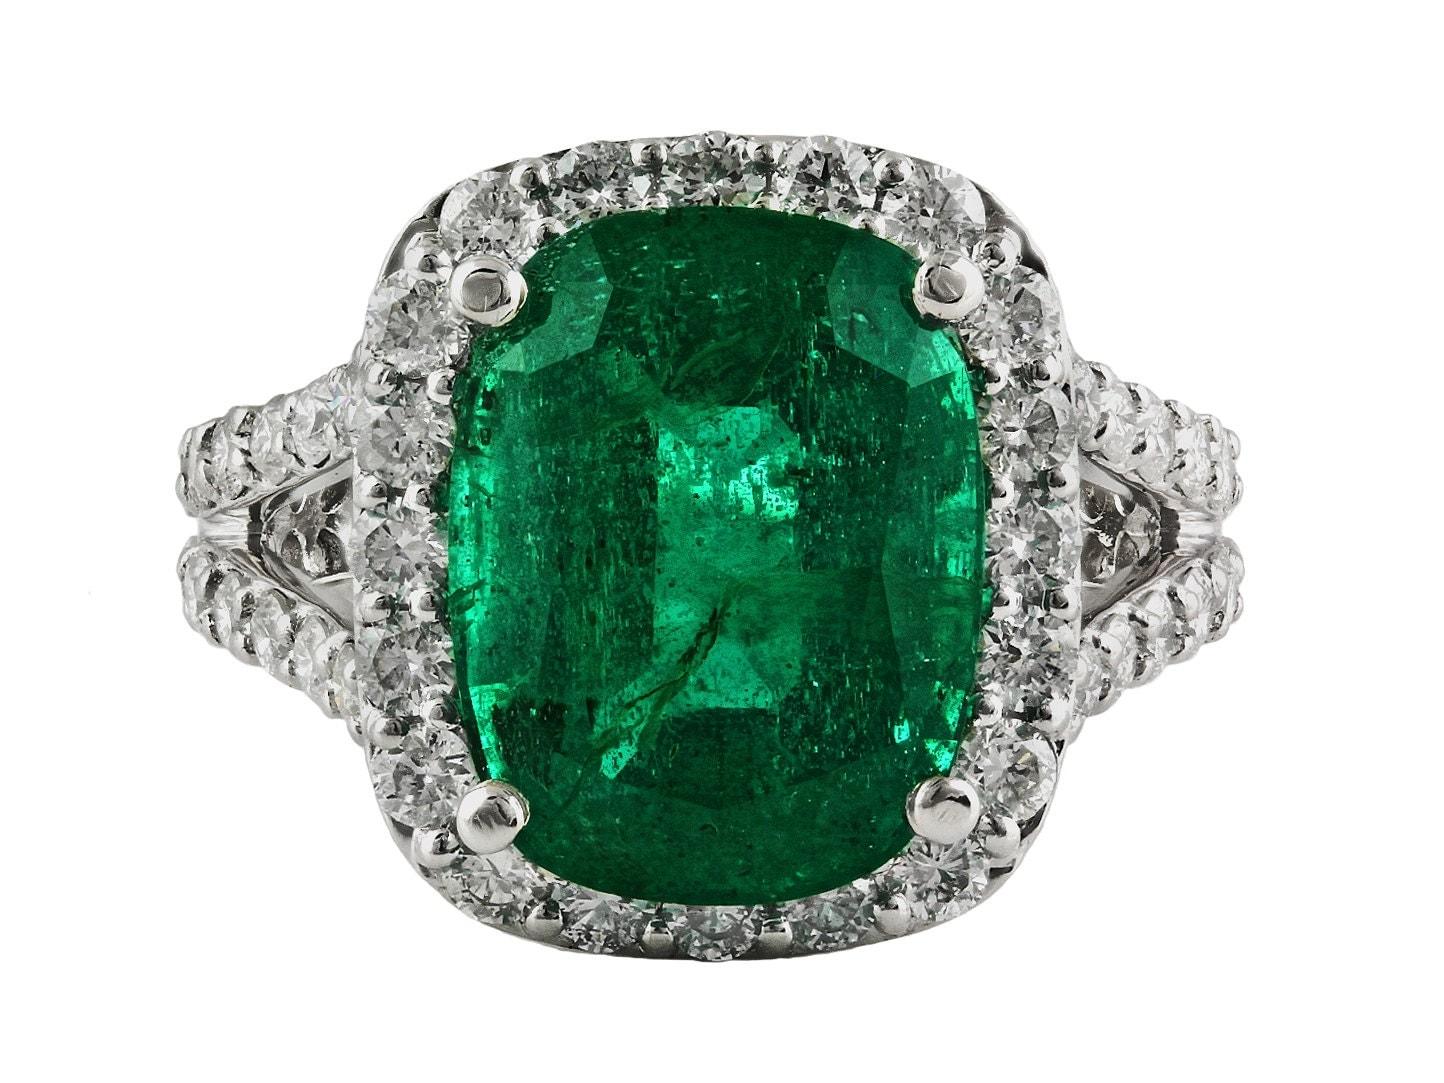 7 47ct Cushion Cut Zambian Emerald With Diamond Accent In 14k